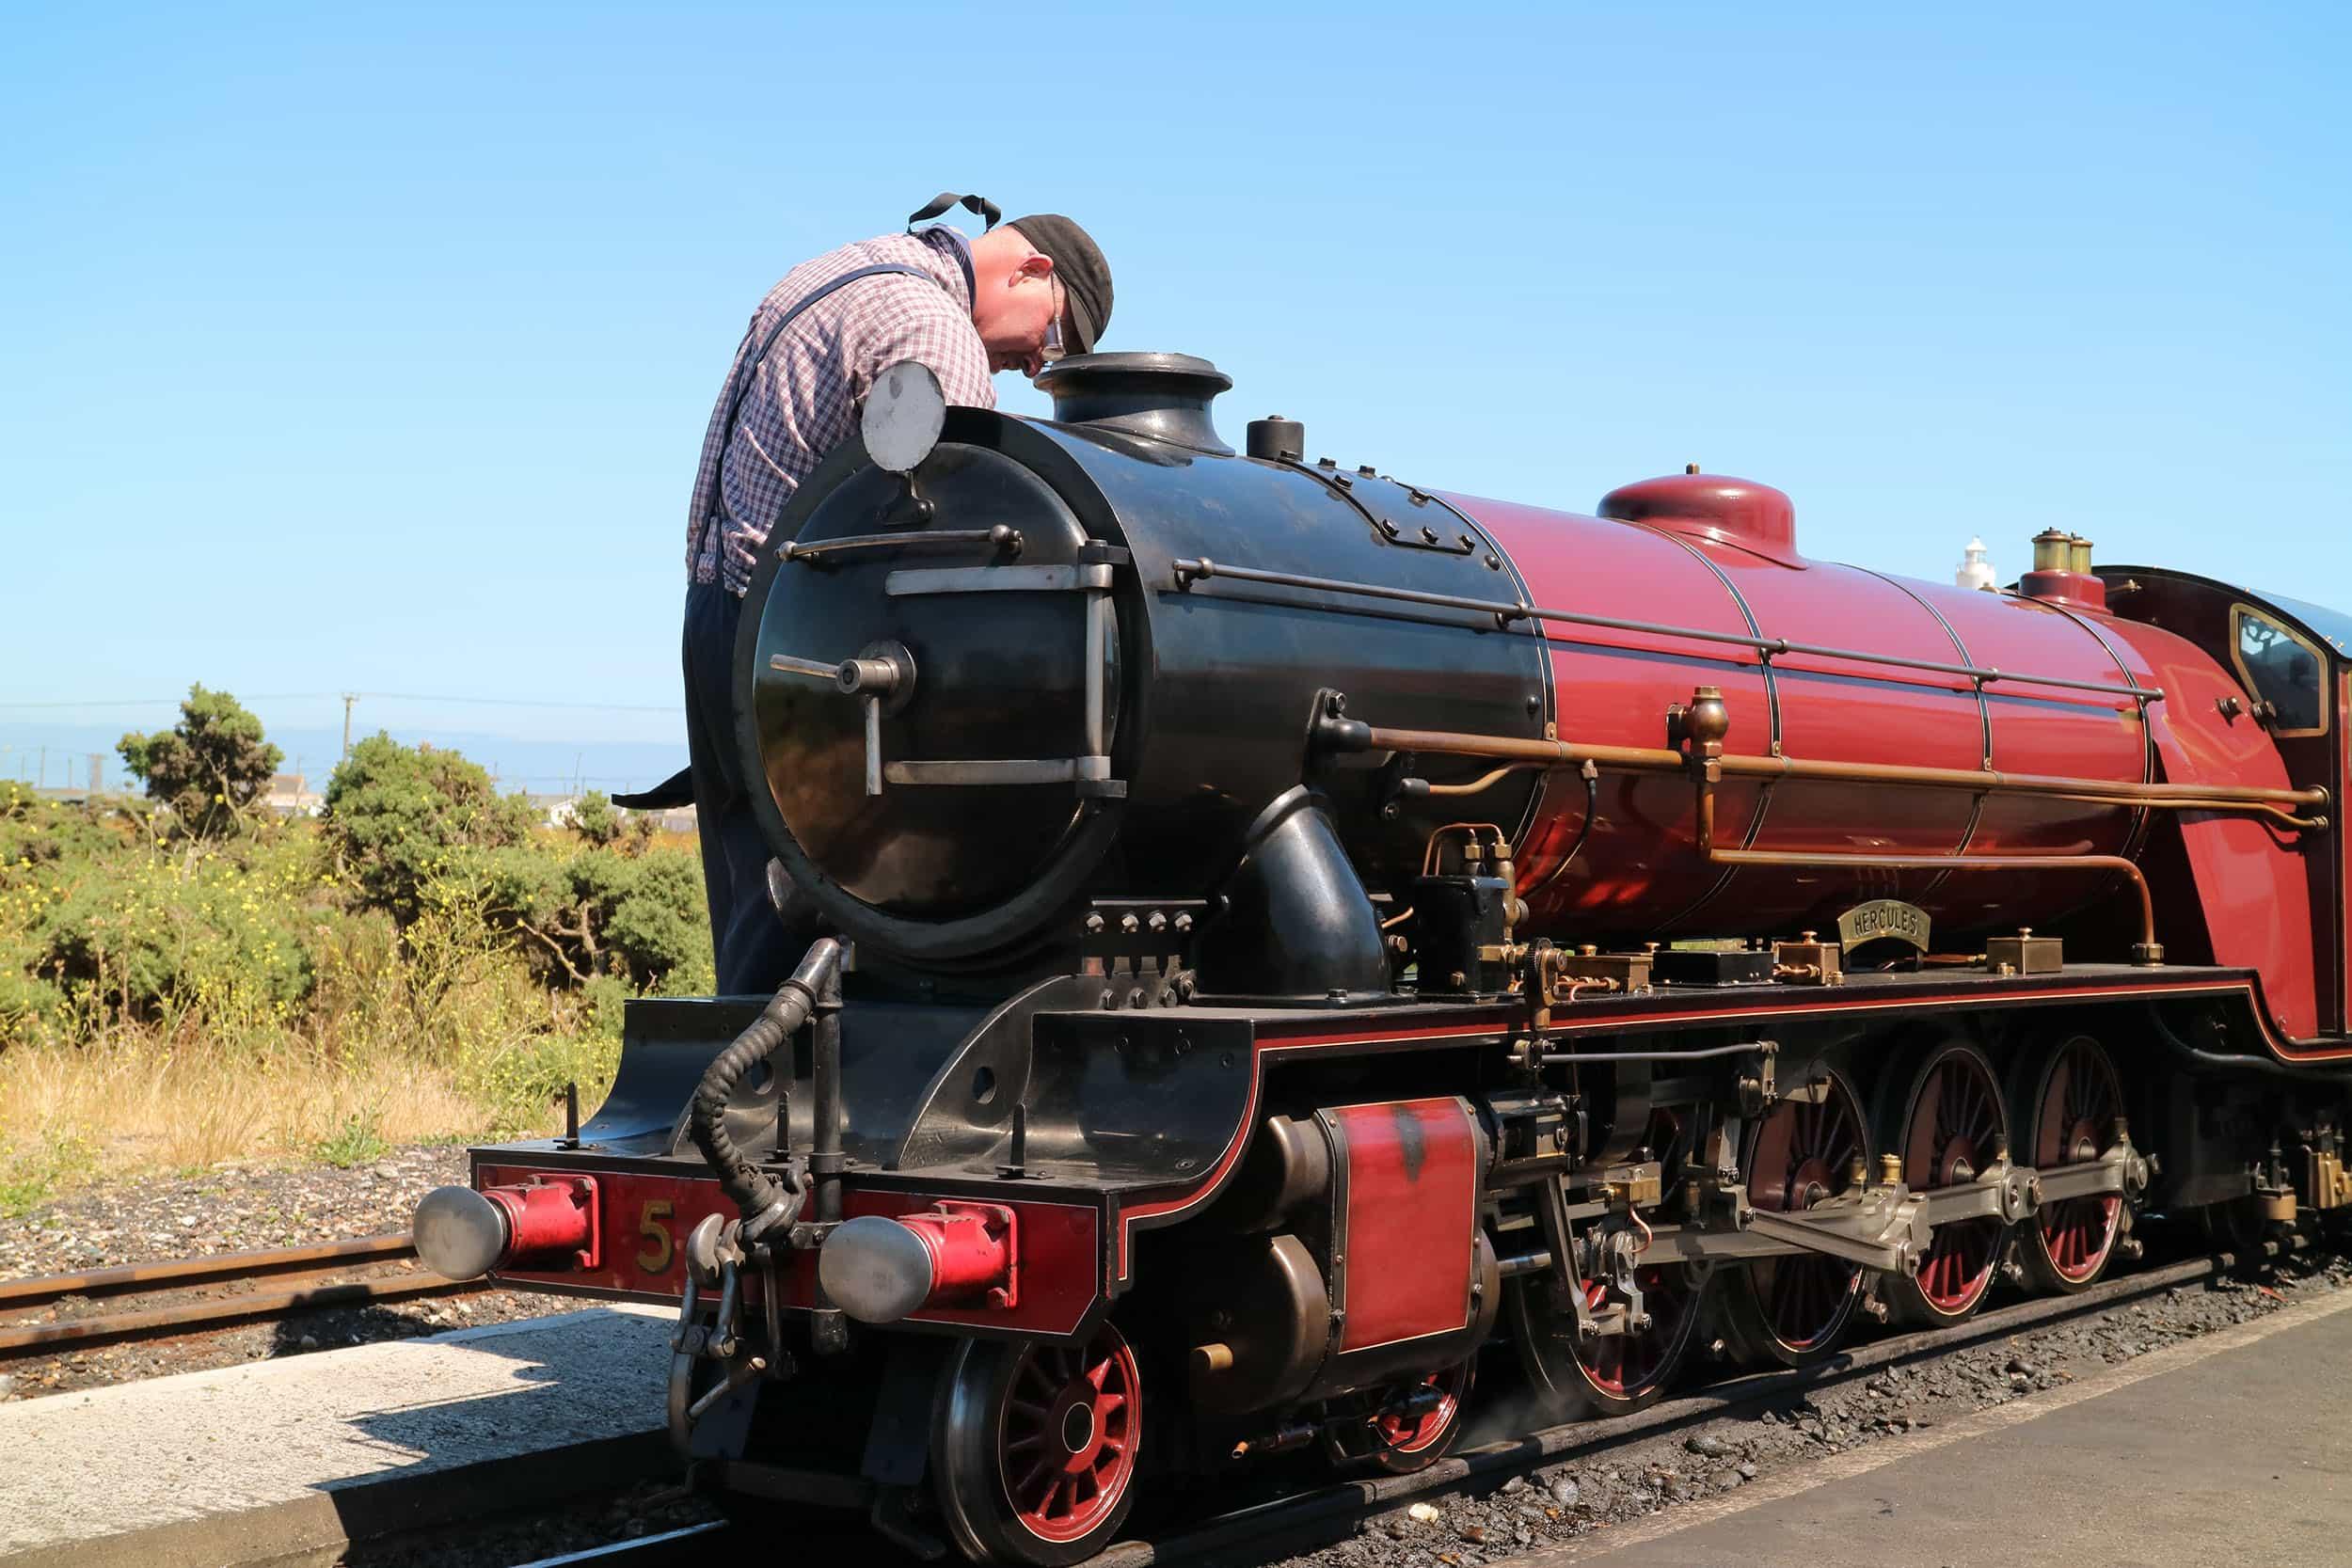 Hercules - Romney, Hythe & Dymchurch Railway